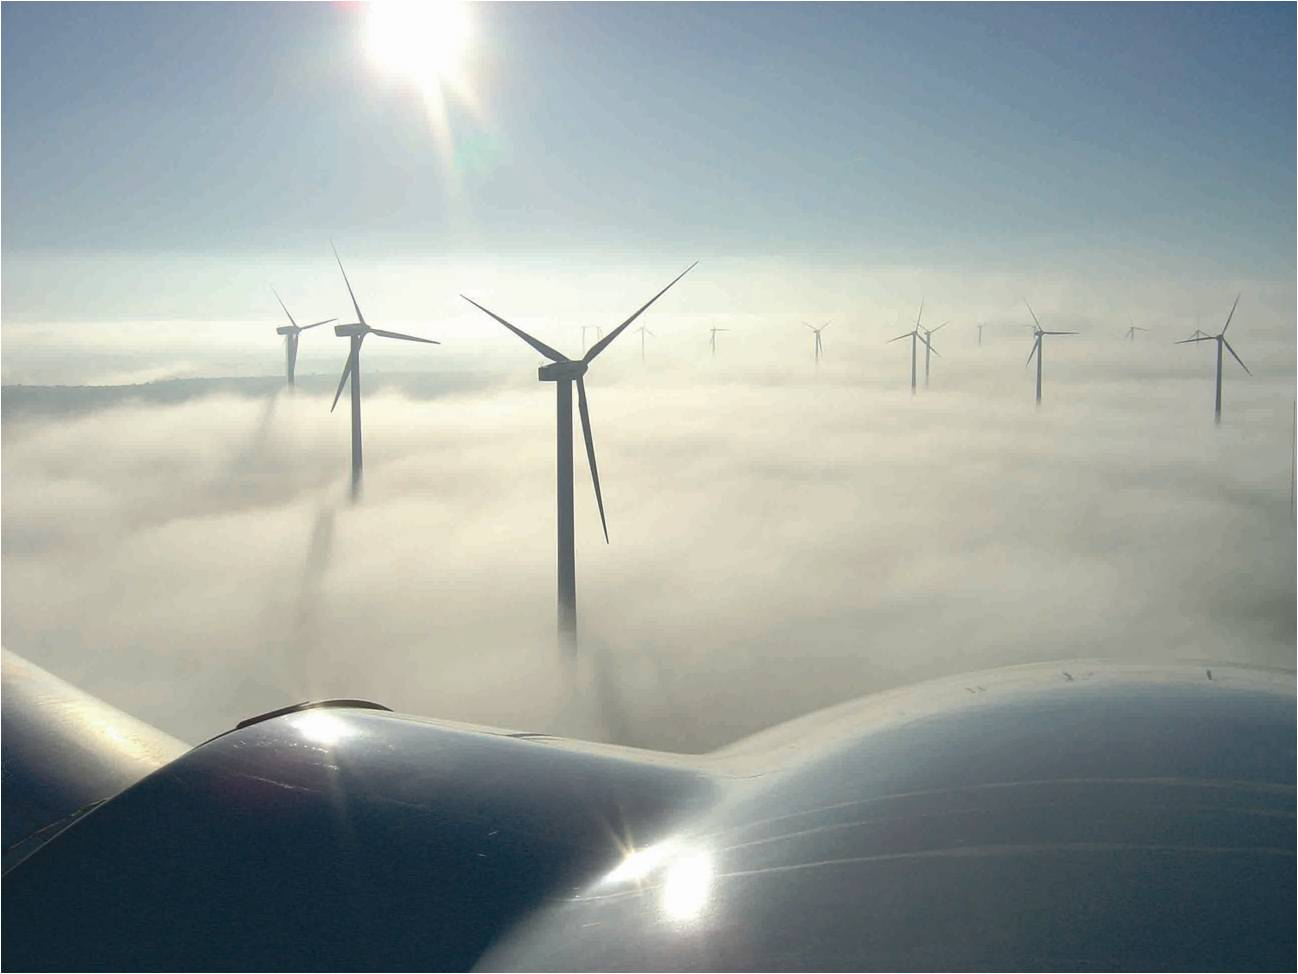 Eólica en Tailandia: Gamesa vende 30 aerogeneradores a tres parques eólicos.